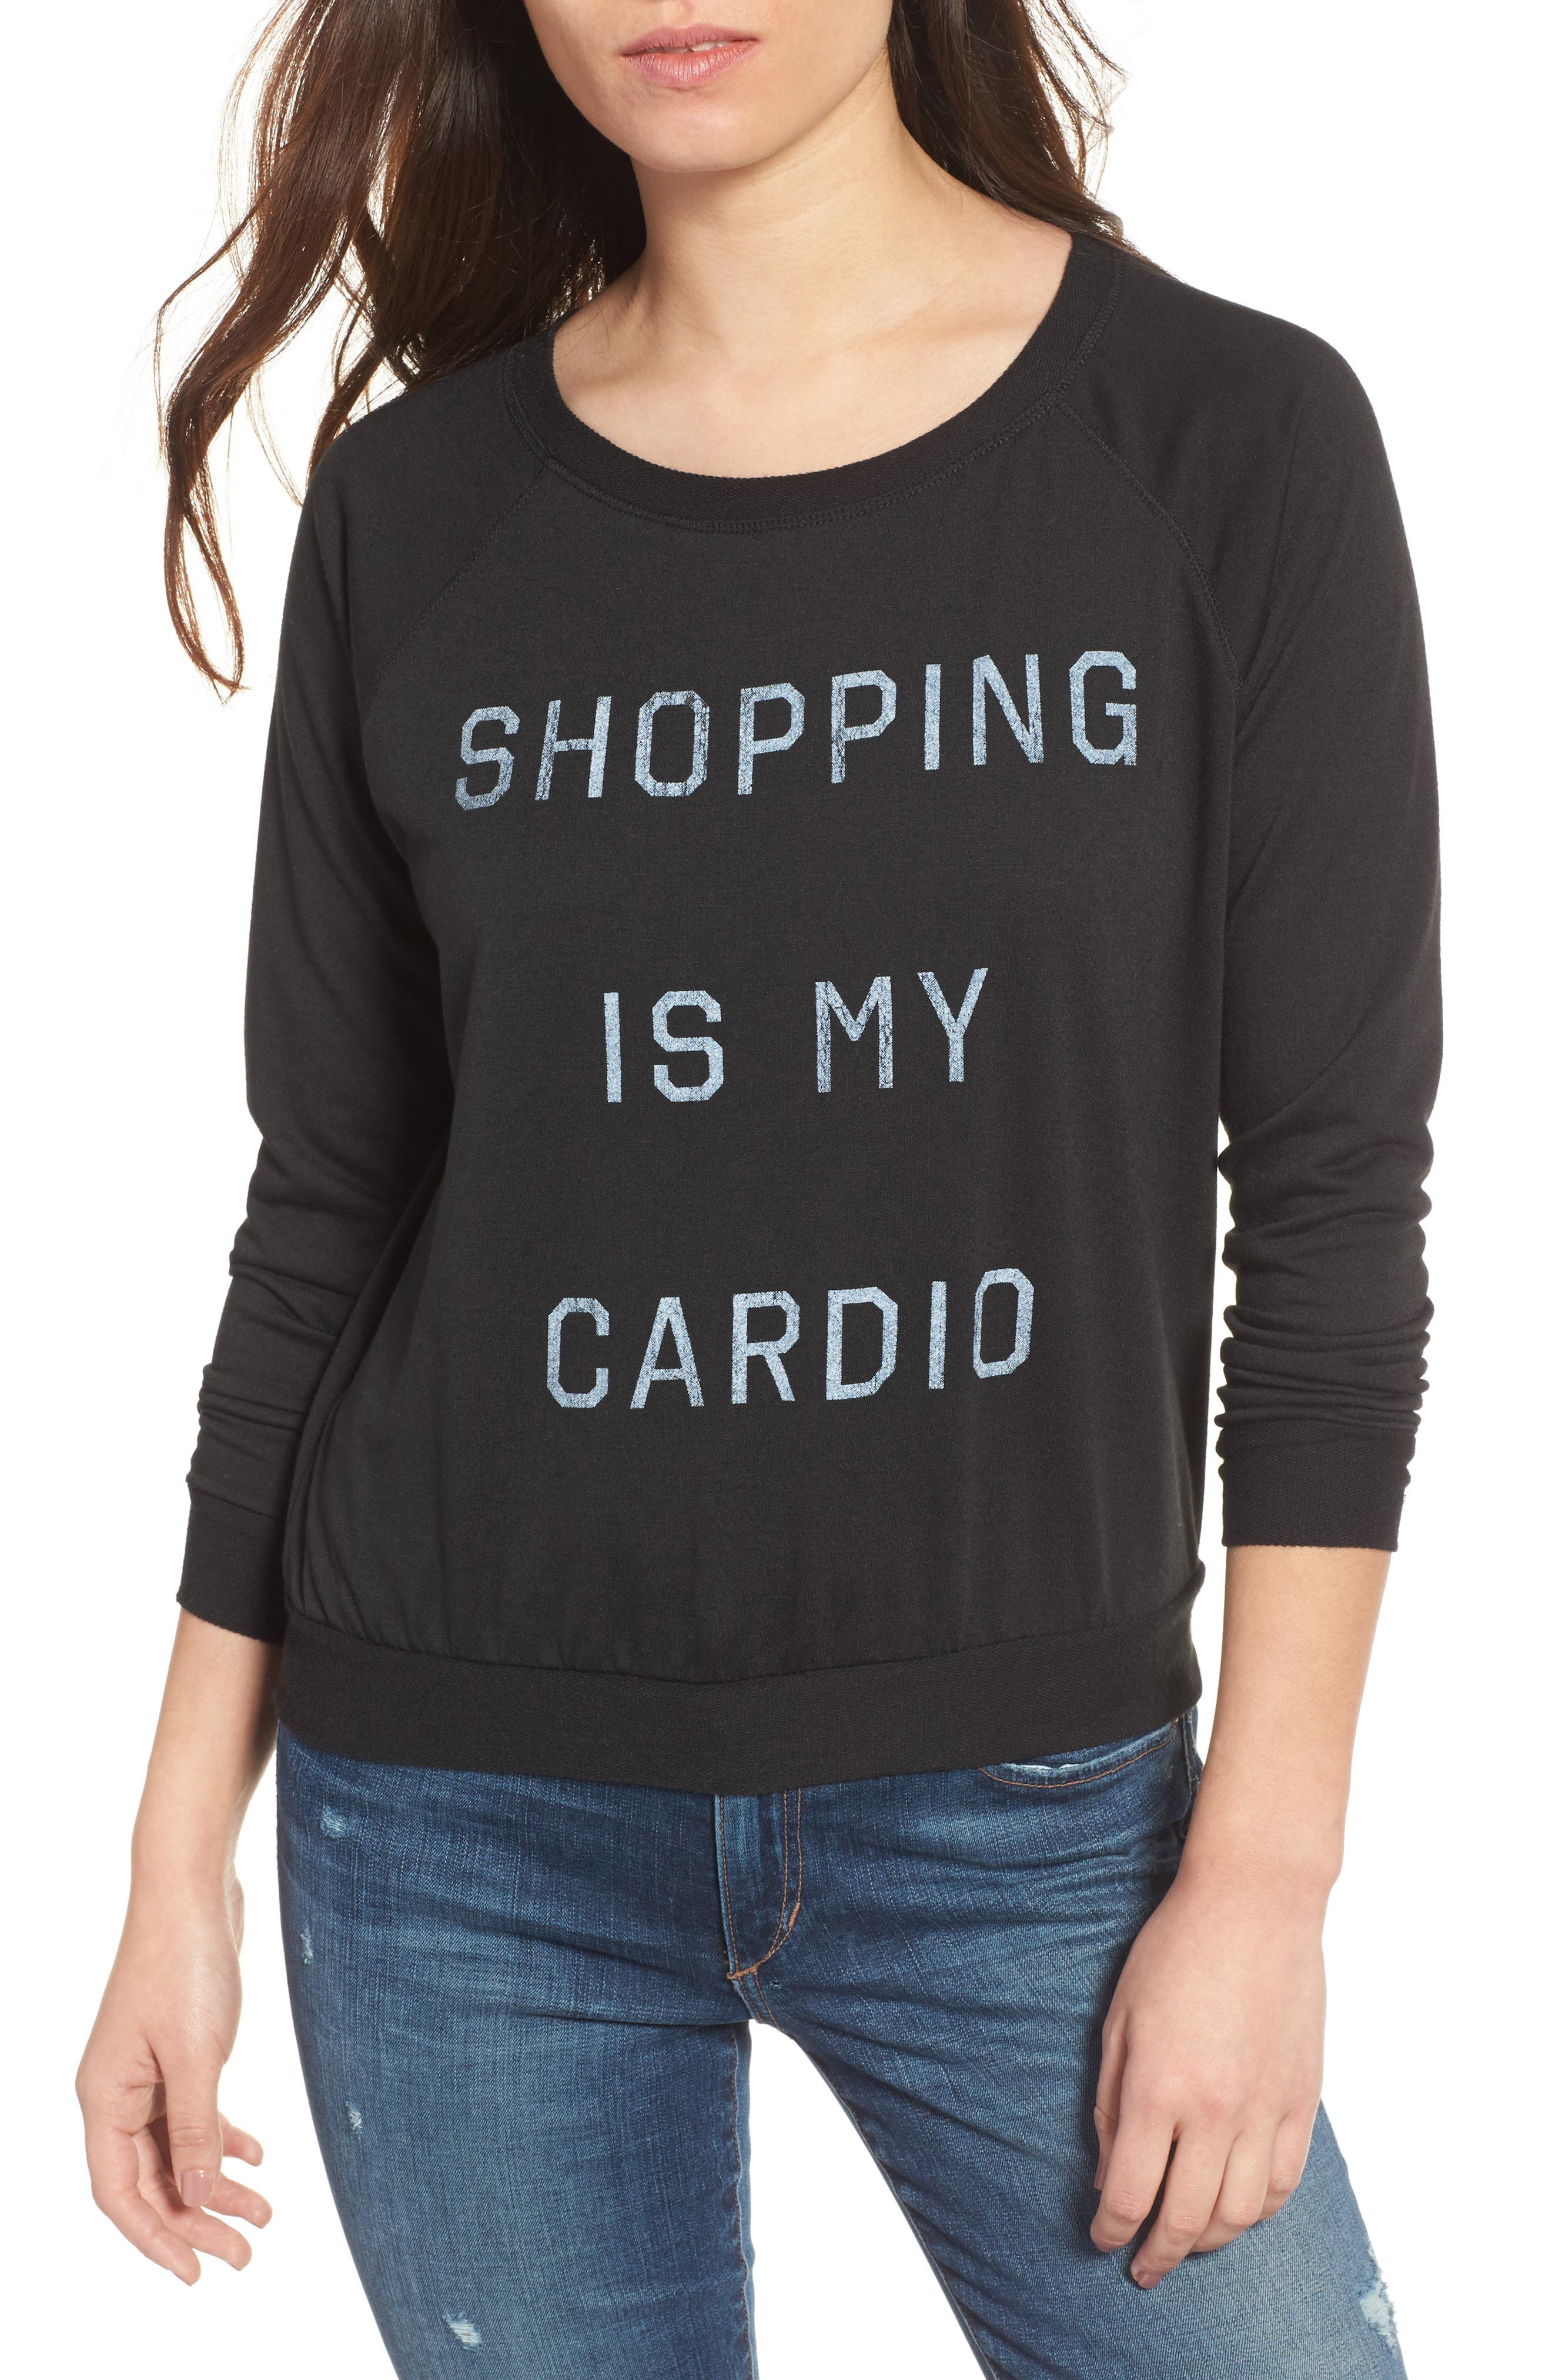 PRINCE PETER Shopping is My Cardio Tee